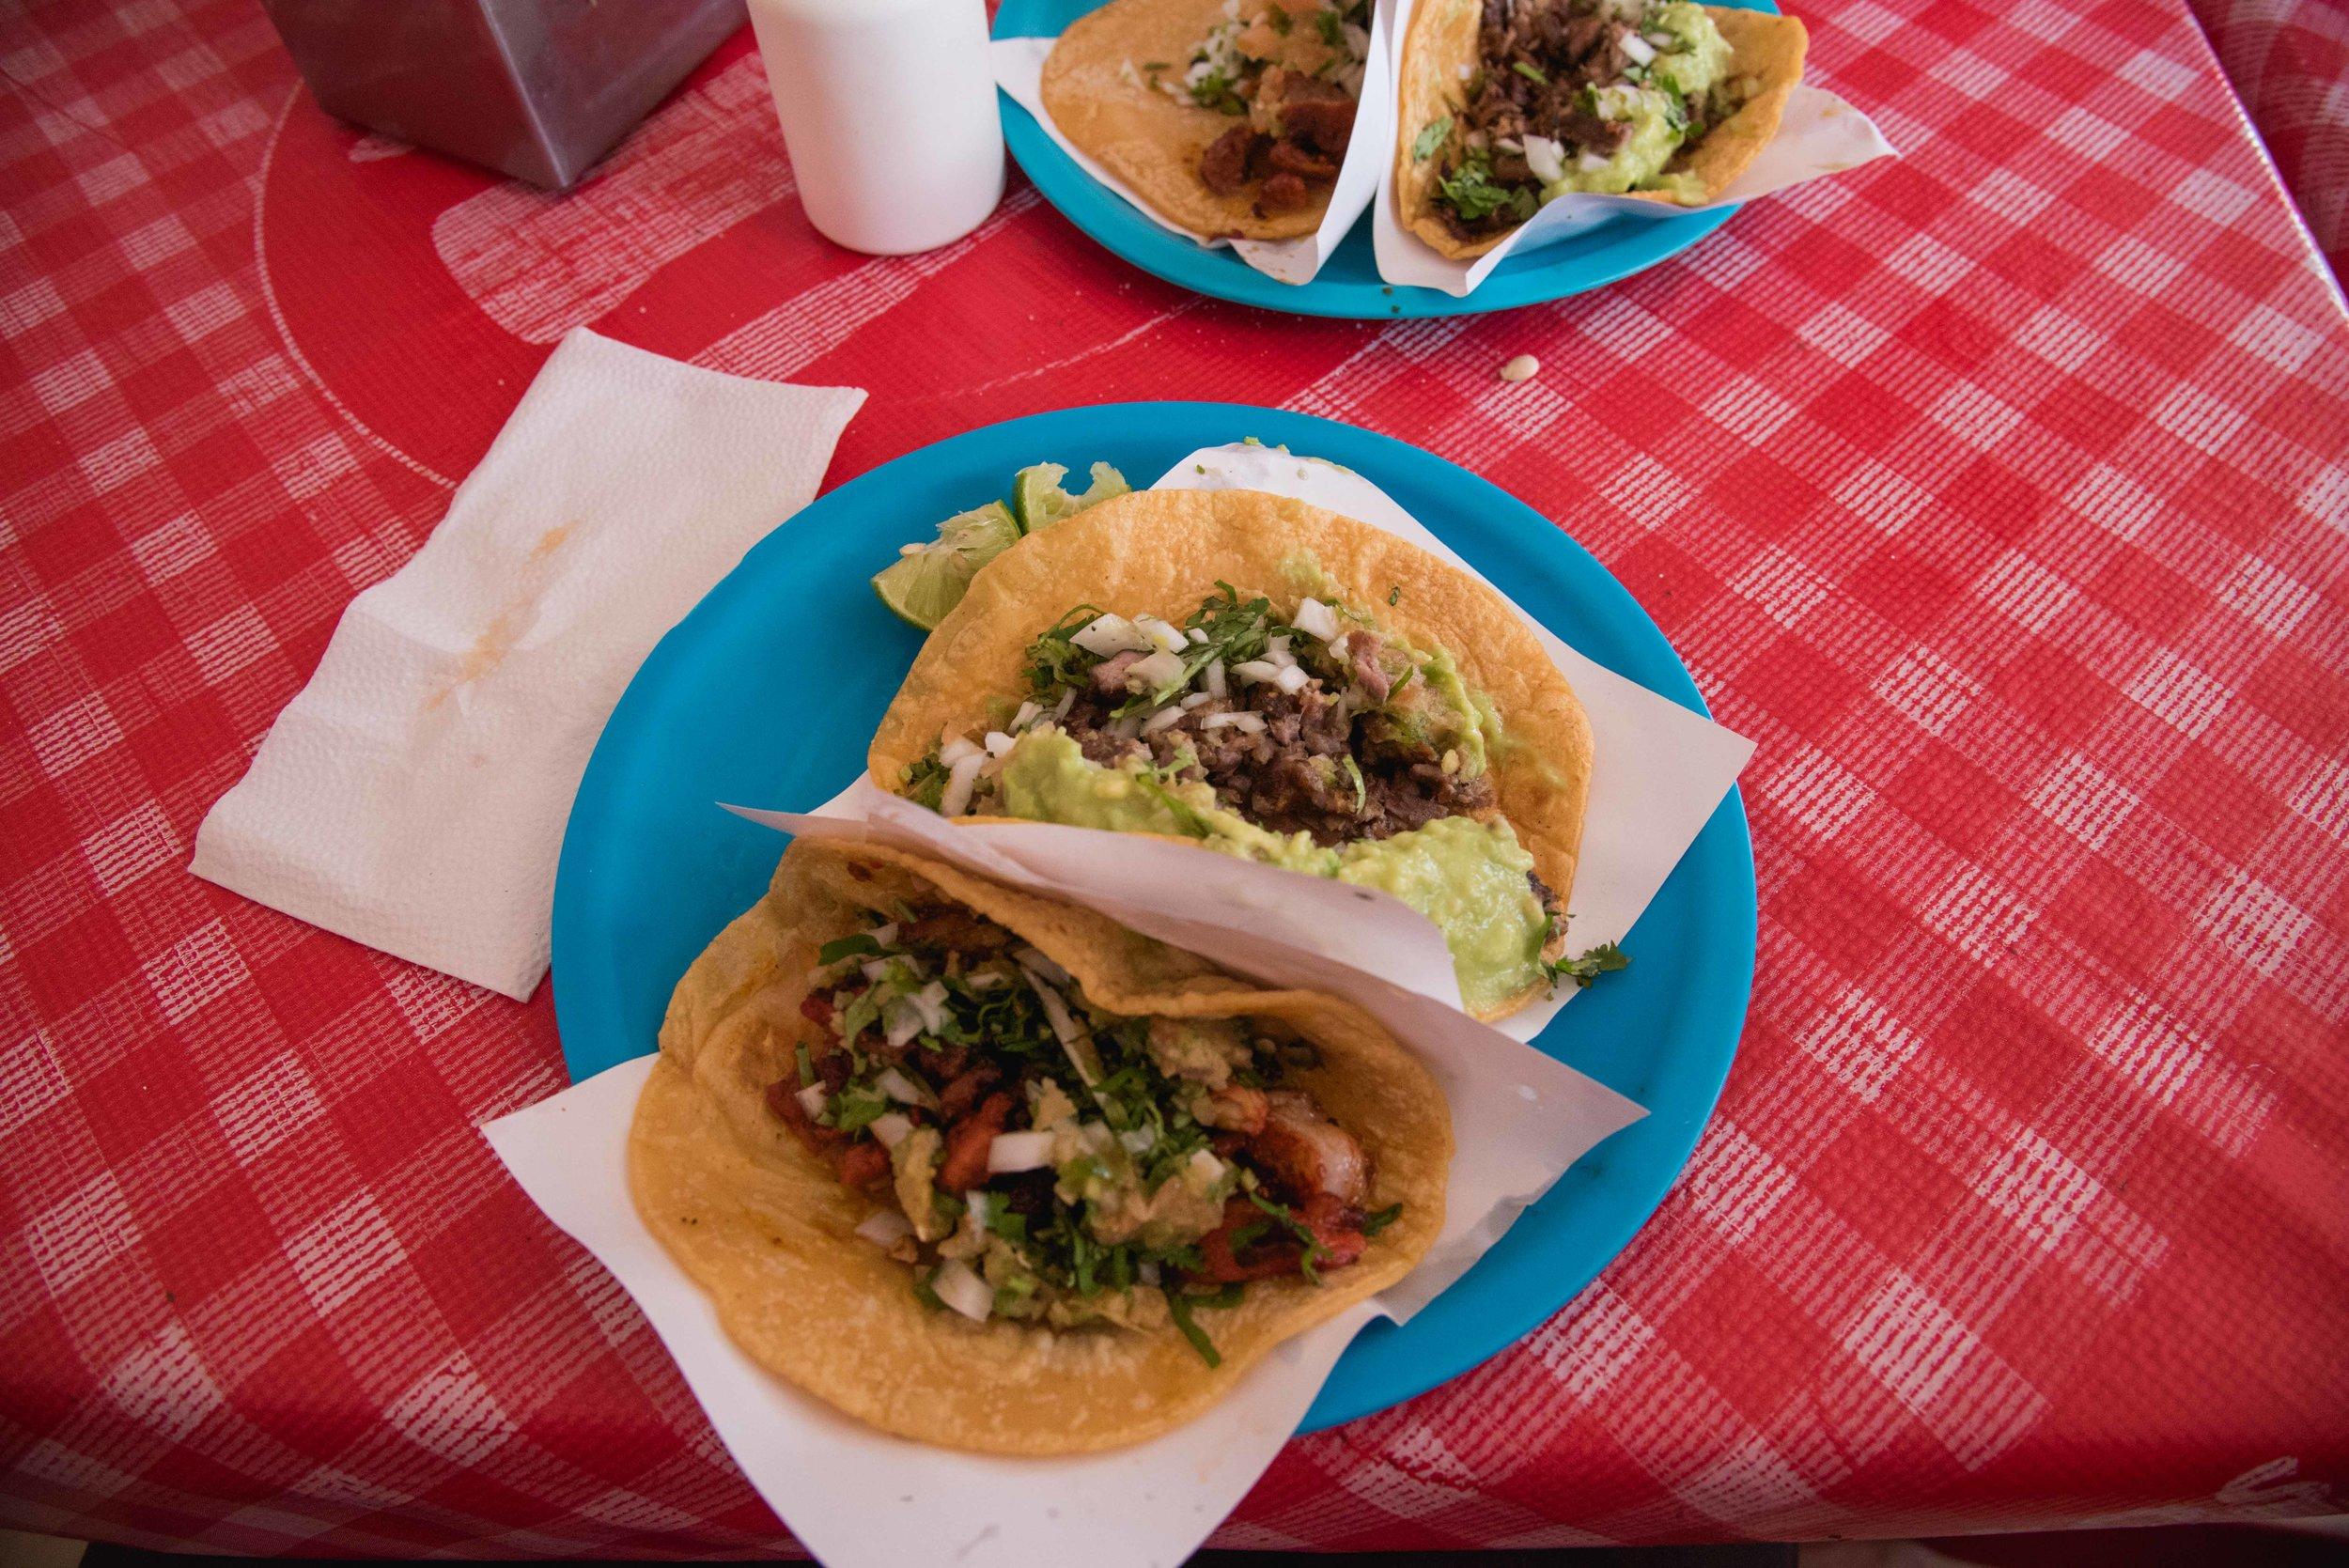 Street taco stop #1.